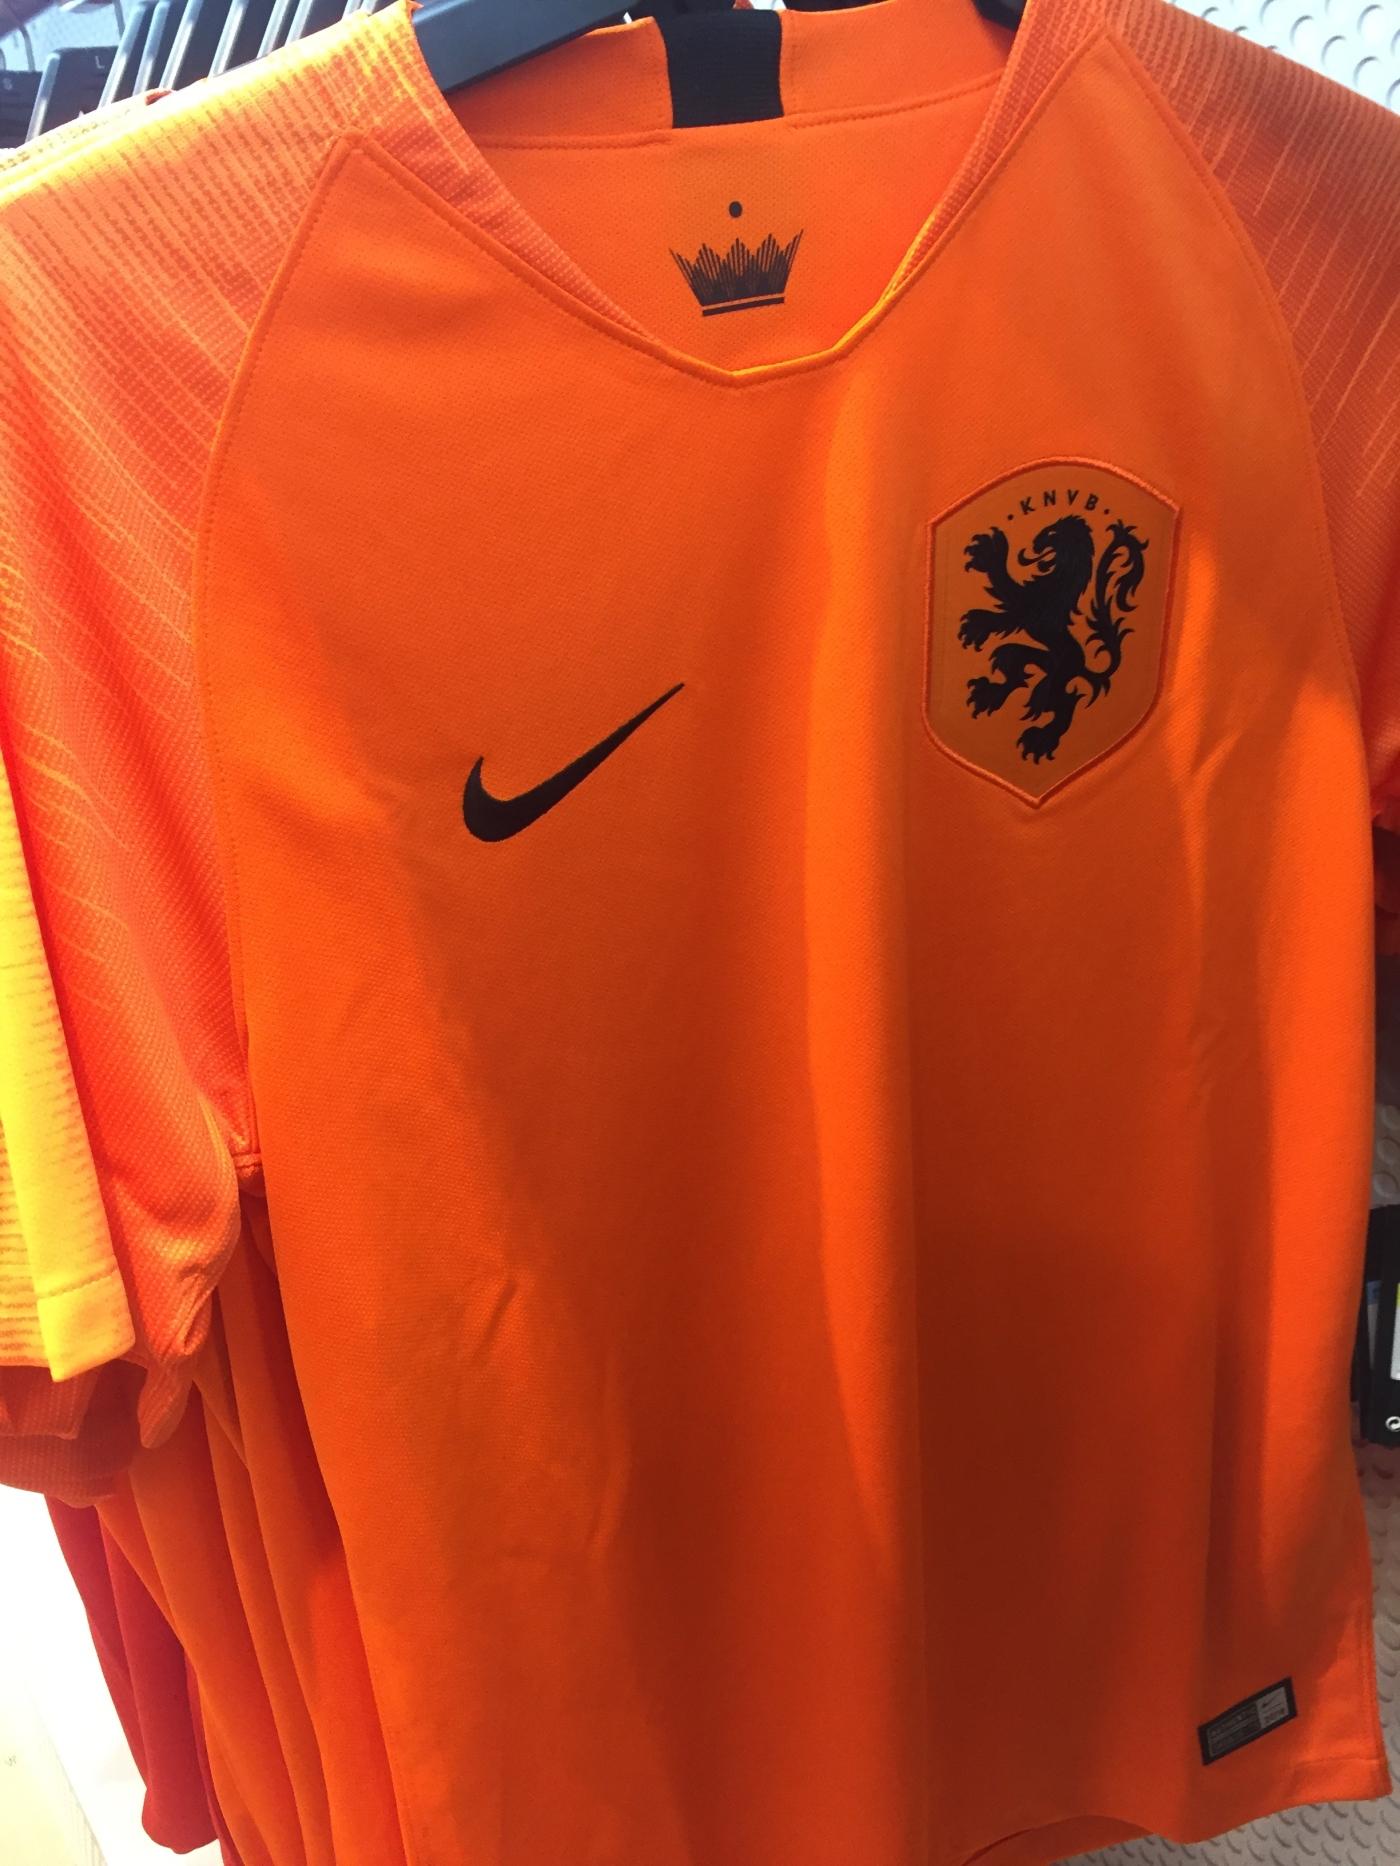 fceca1753 Nike Non-World Cup Jerseys  2018 Netherlands Home Kit – New Shark City